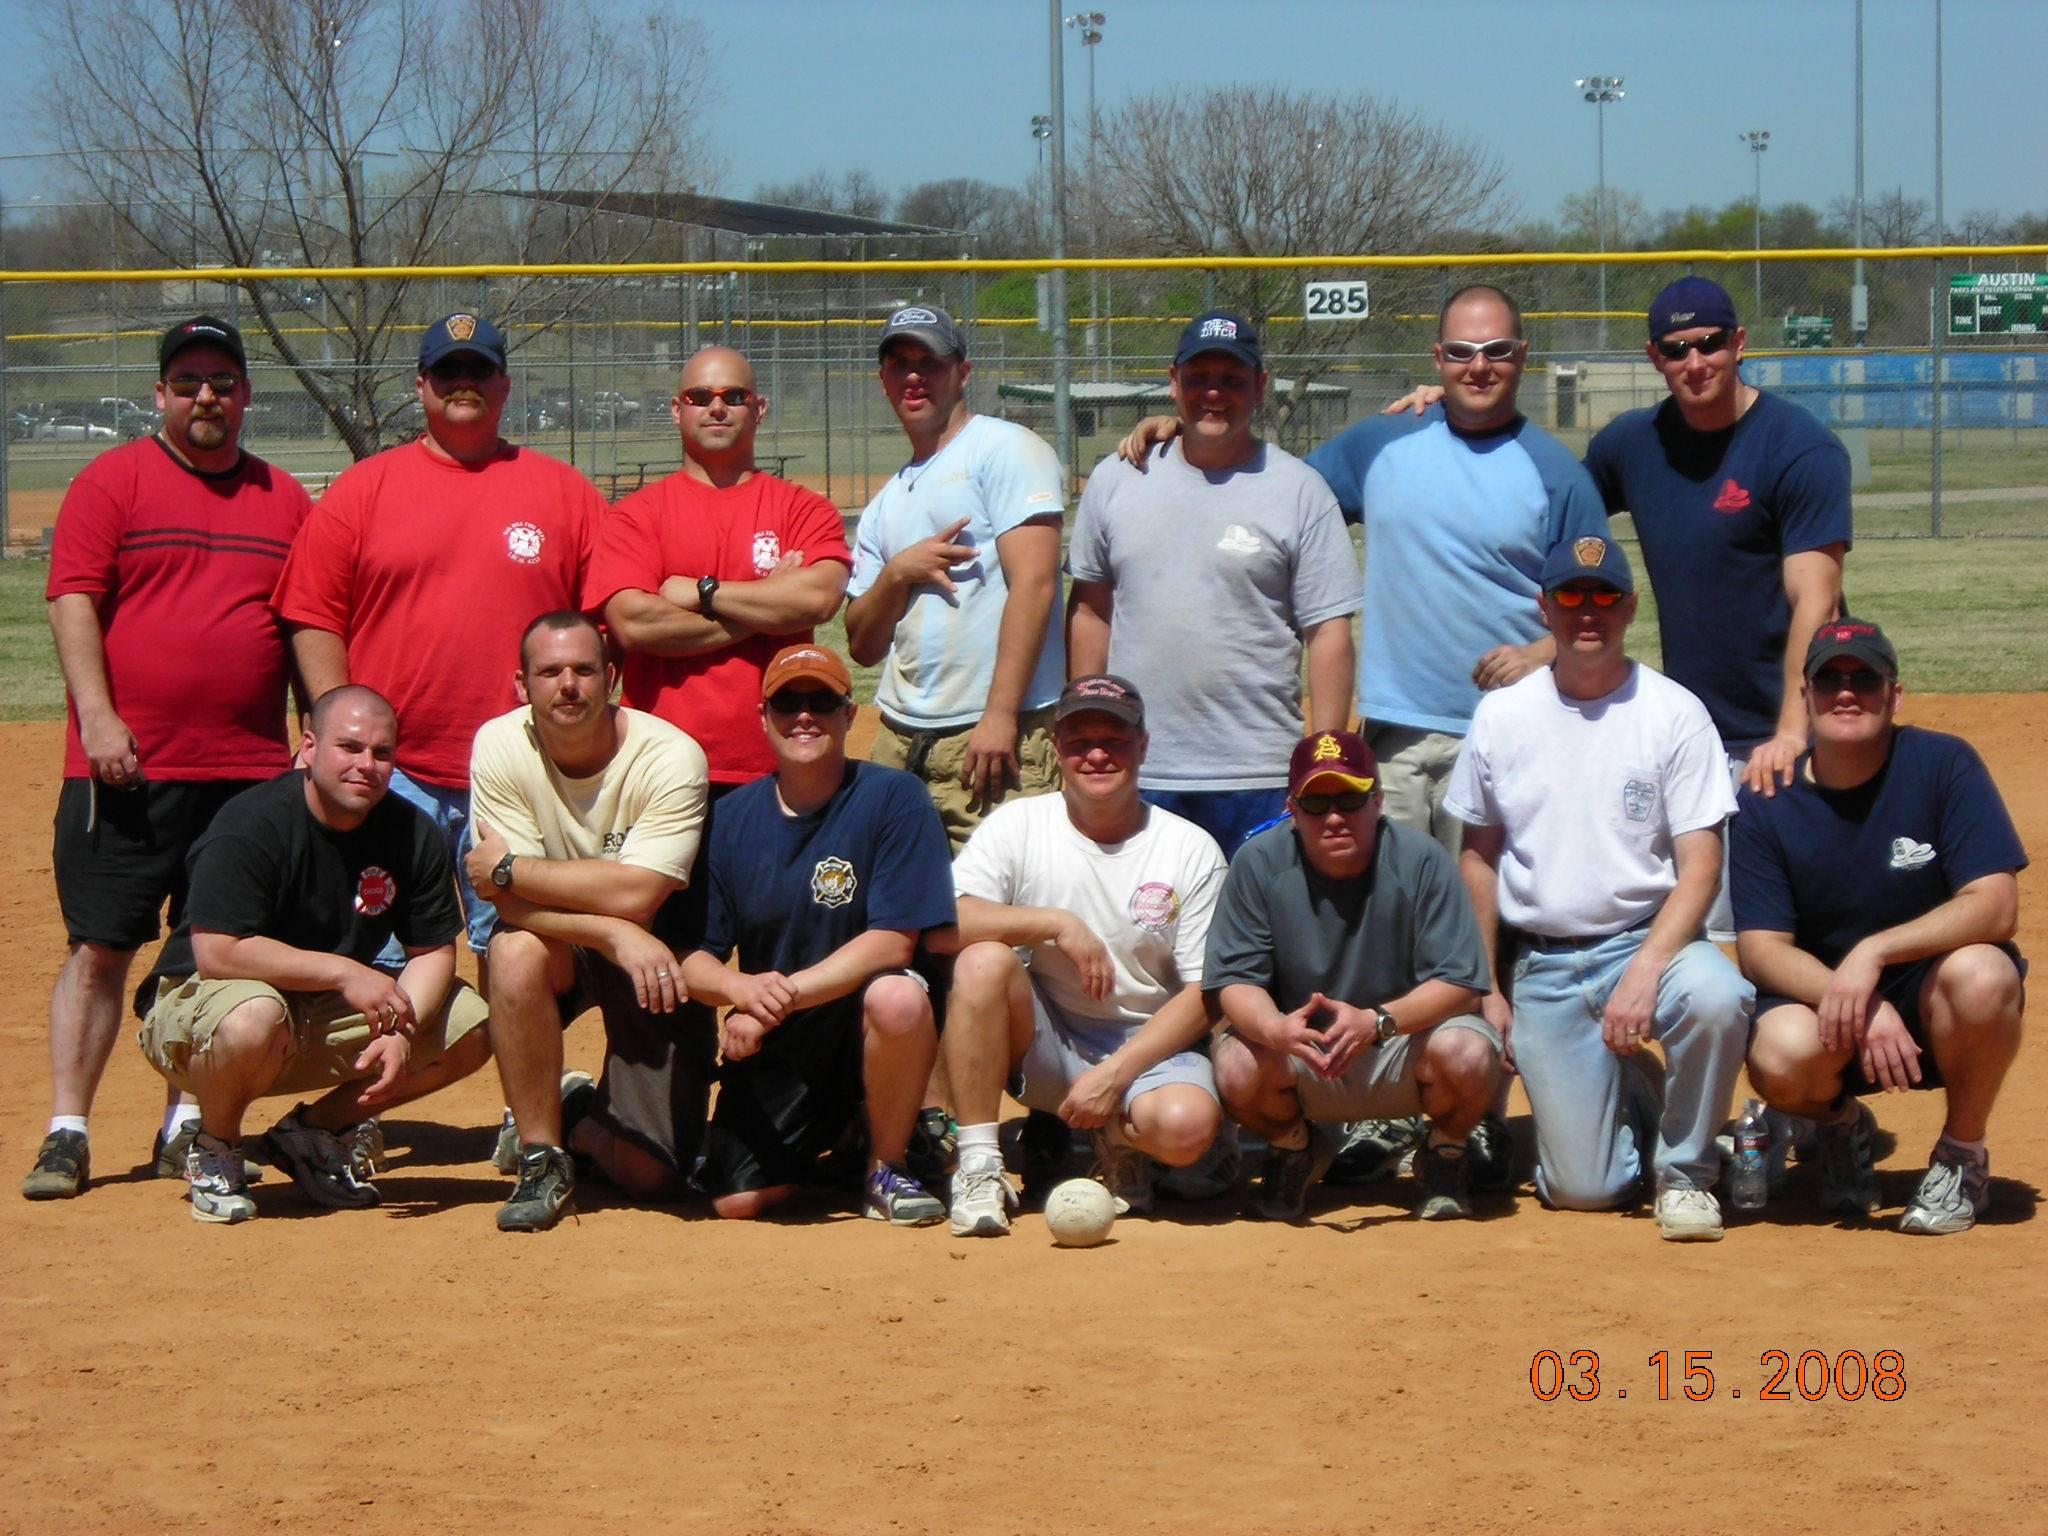 Softball Tournament - Cohnway far left, front row